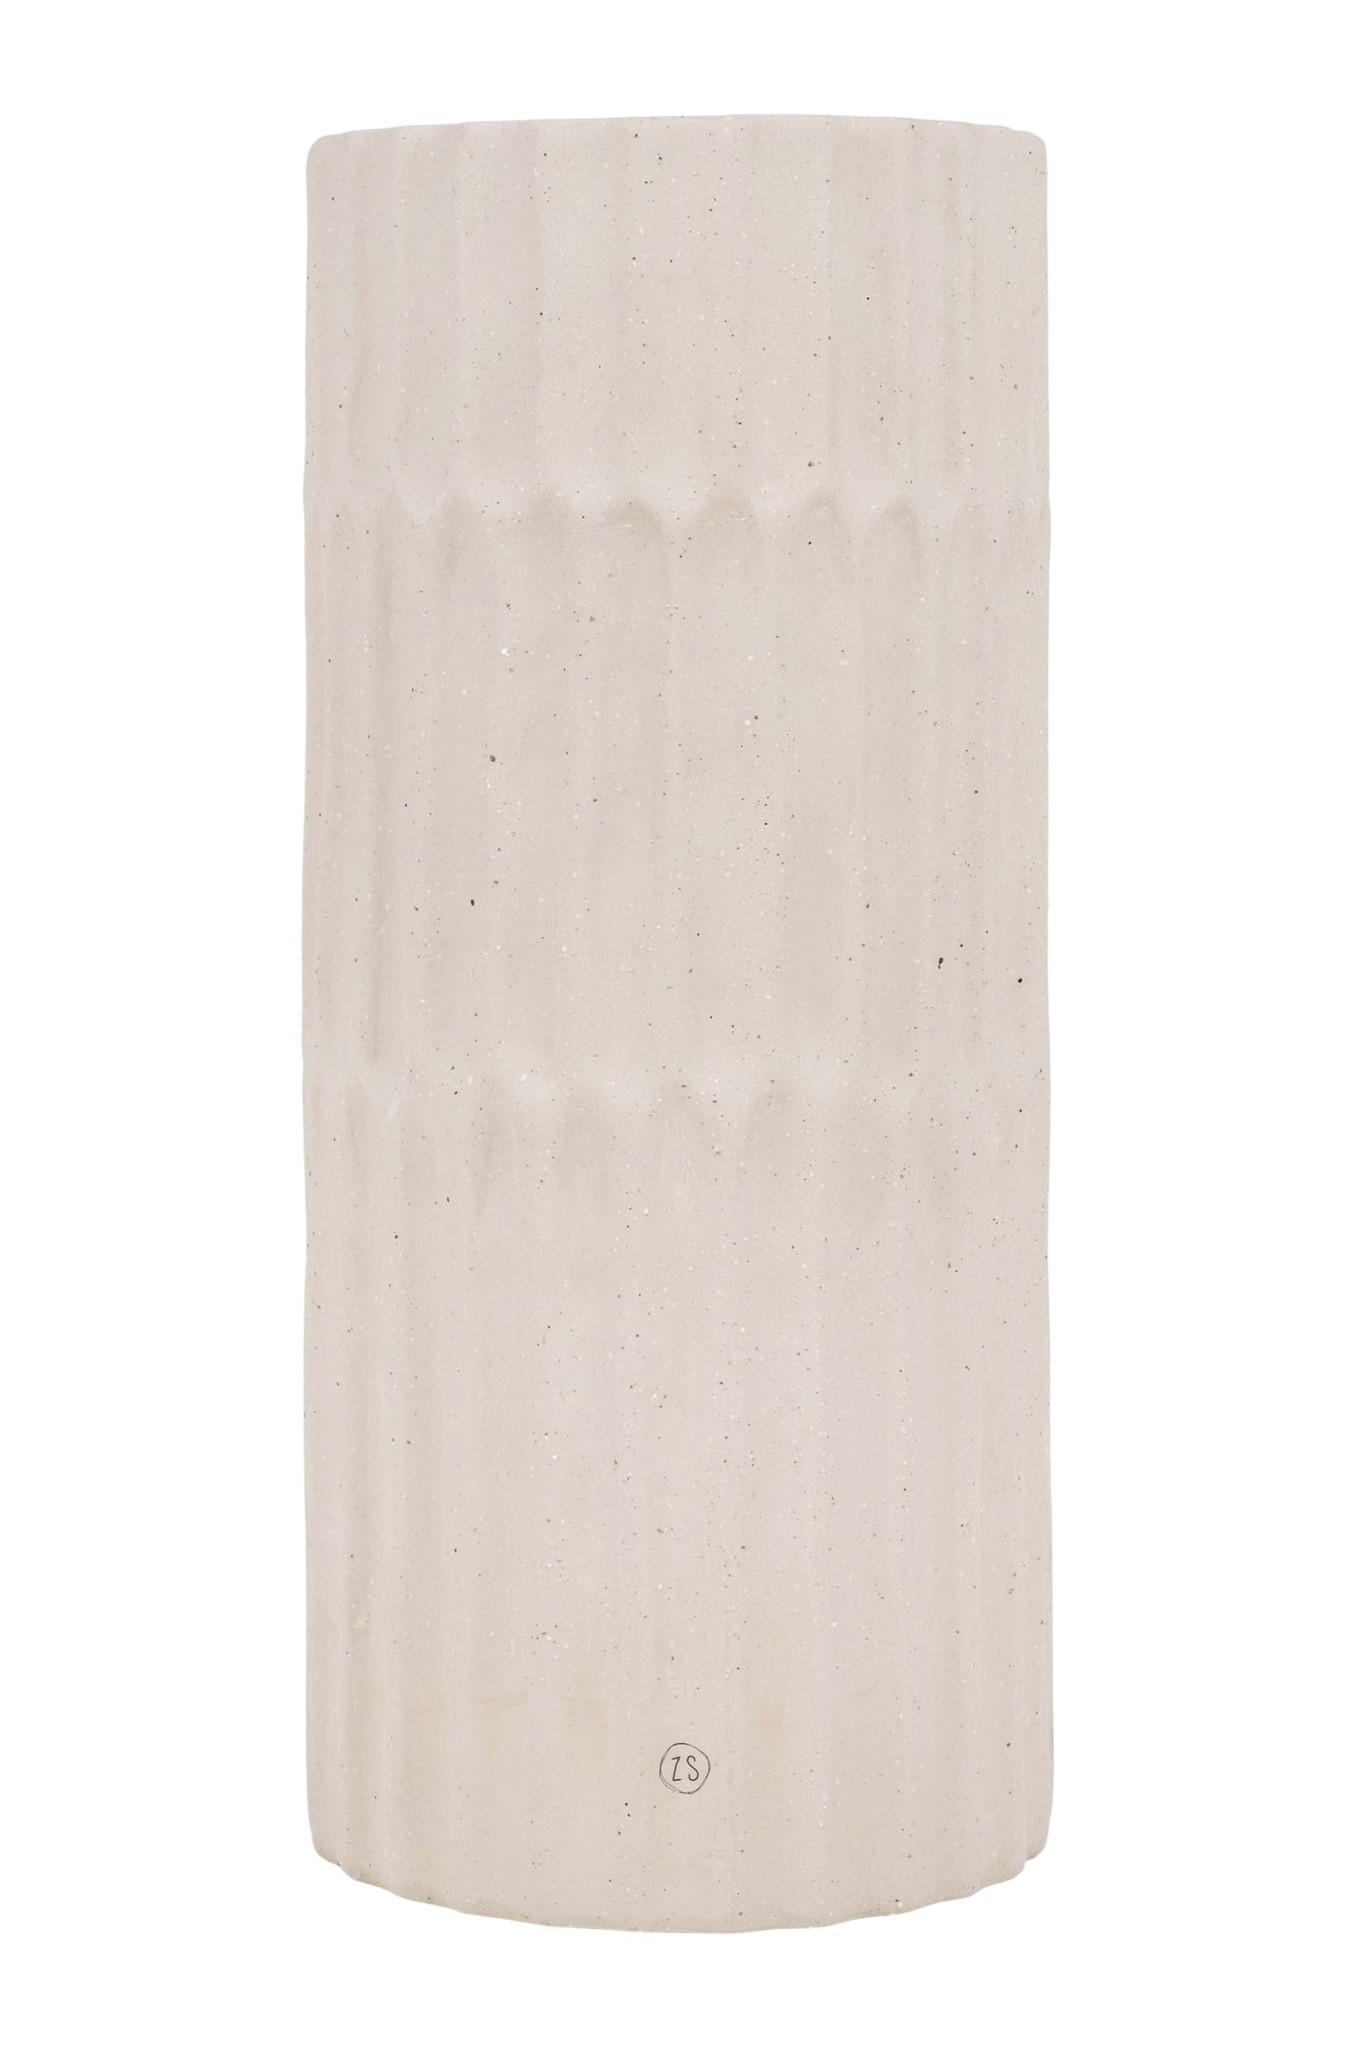 Zusss ribbelvaas keramiek spikkels - zand